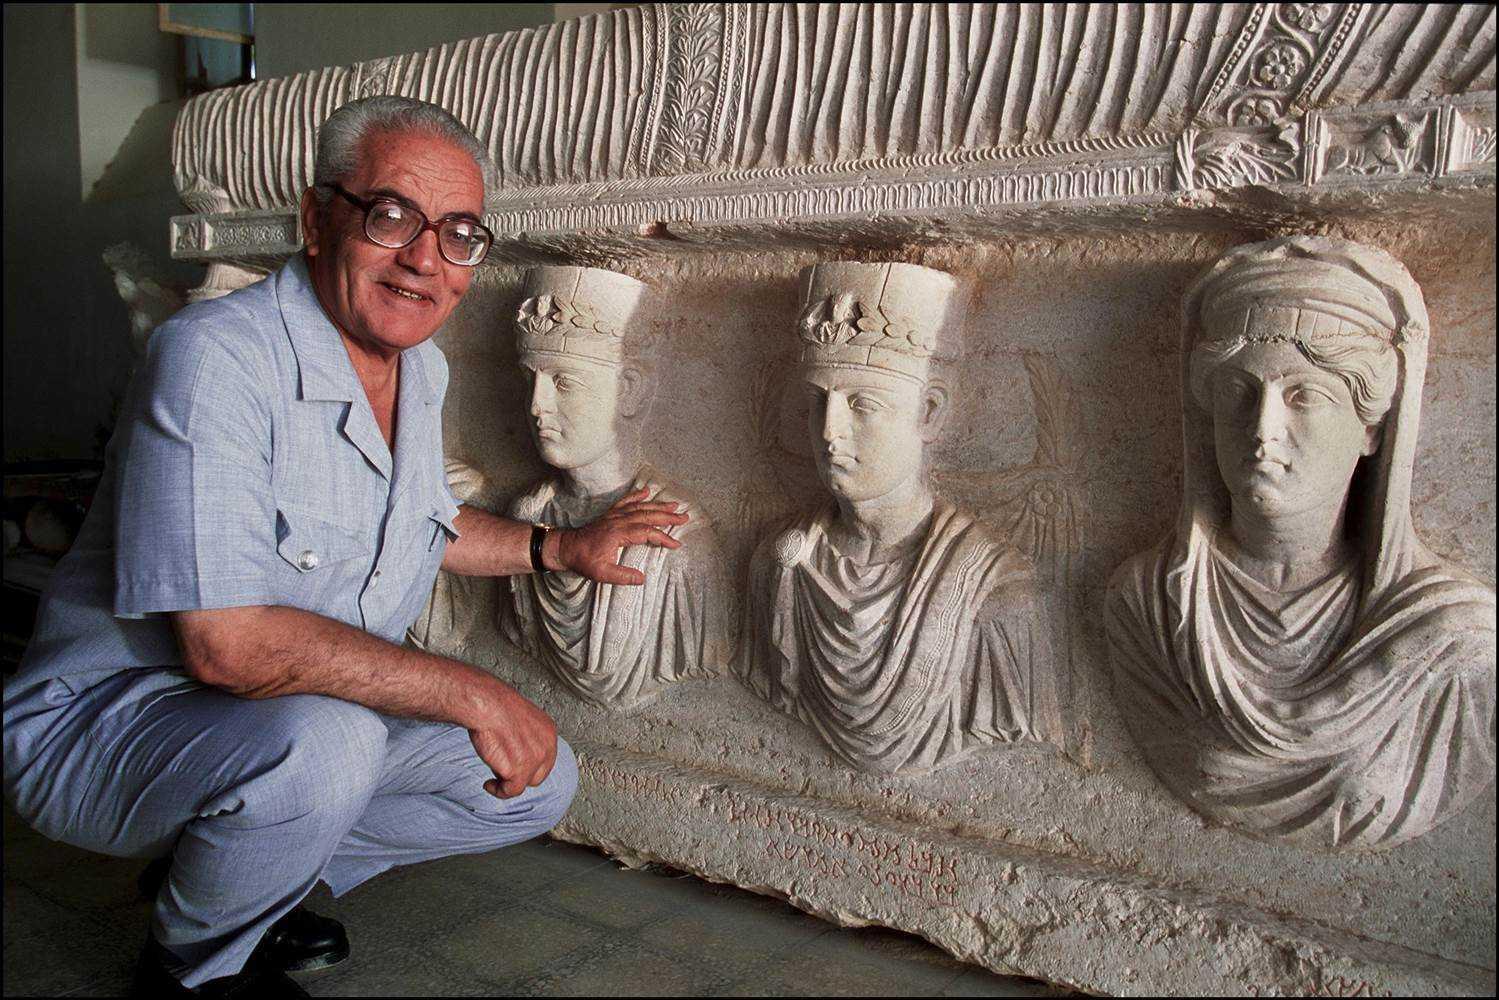 ISIS Behead Pioneer Archaeologist, Khaled Al-Asaad,  In Syria | Khaled Al-Asaad